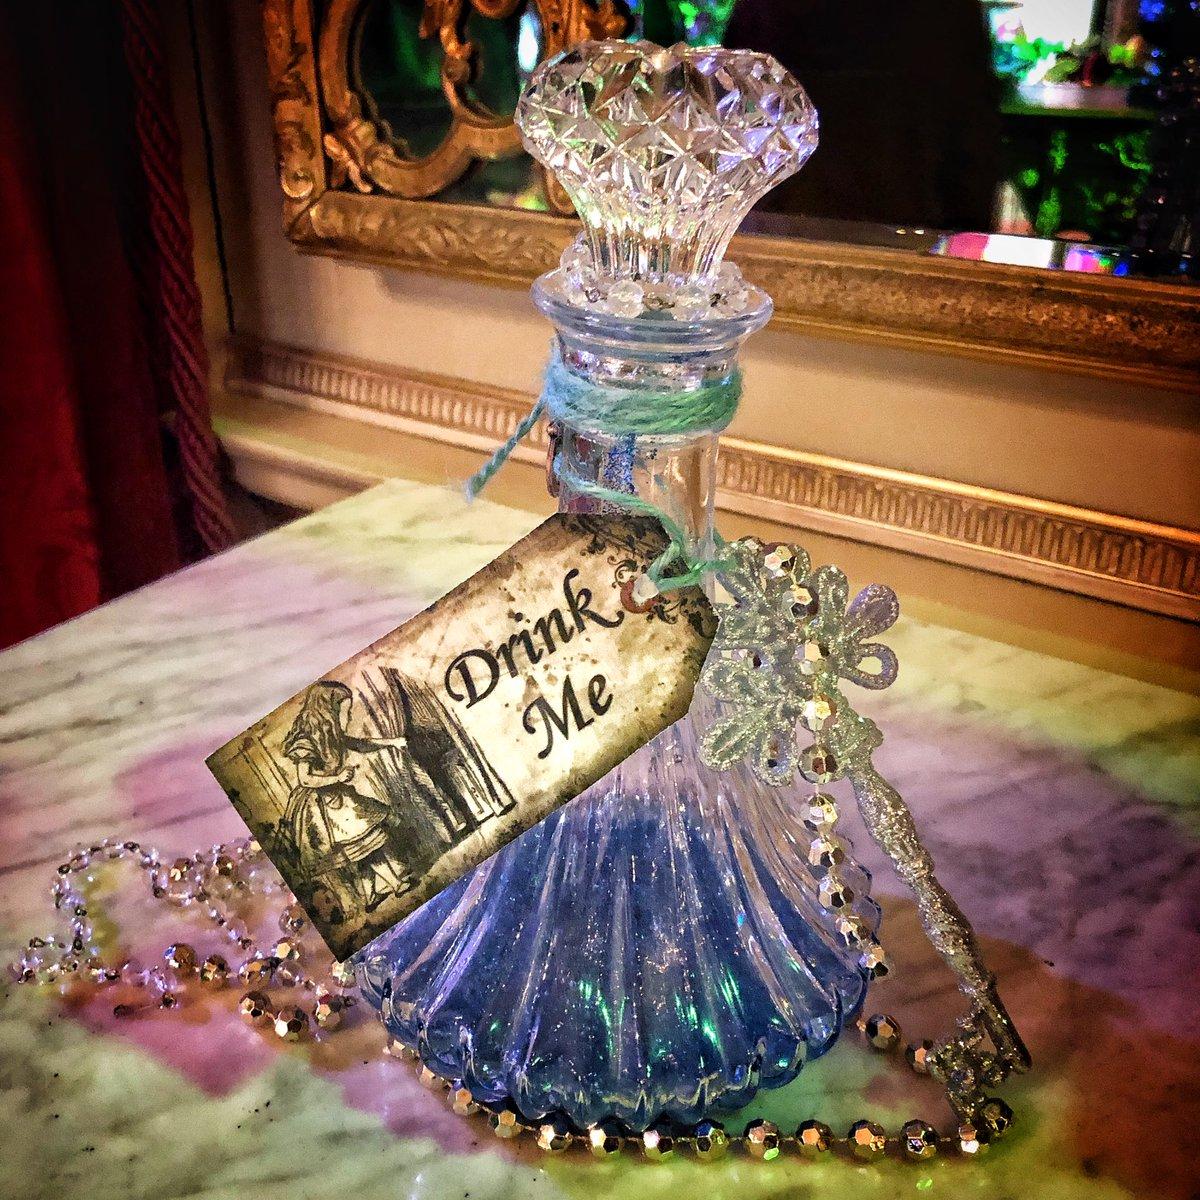 Temptation! Alice at the Palace at Blenheim Palace Christmas. 🐰🎄🕳 #aliceinthepalace #blenheim #aliceinwonderland #christmas #blenheimpalace #drinkme #christmastime @BlenheimPalace